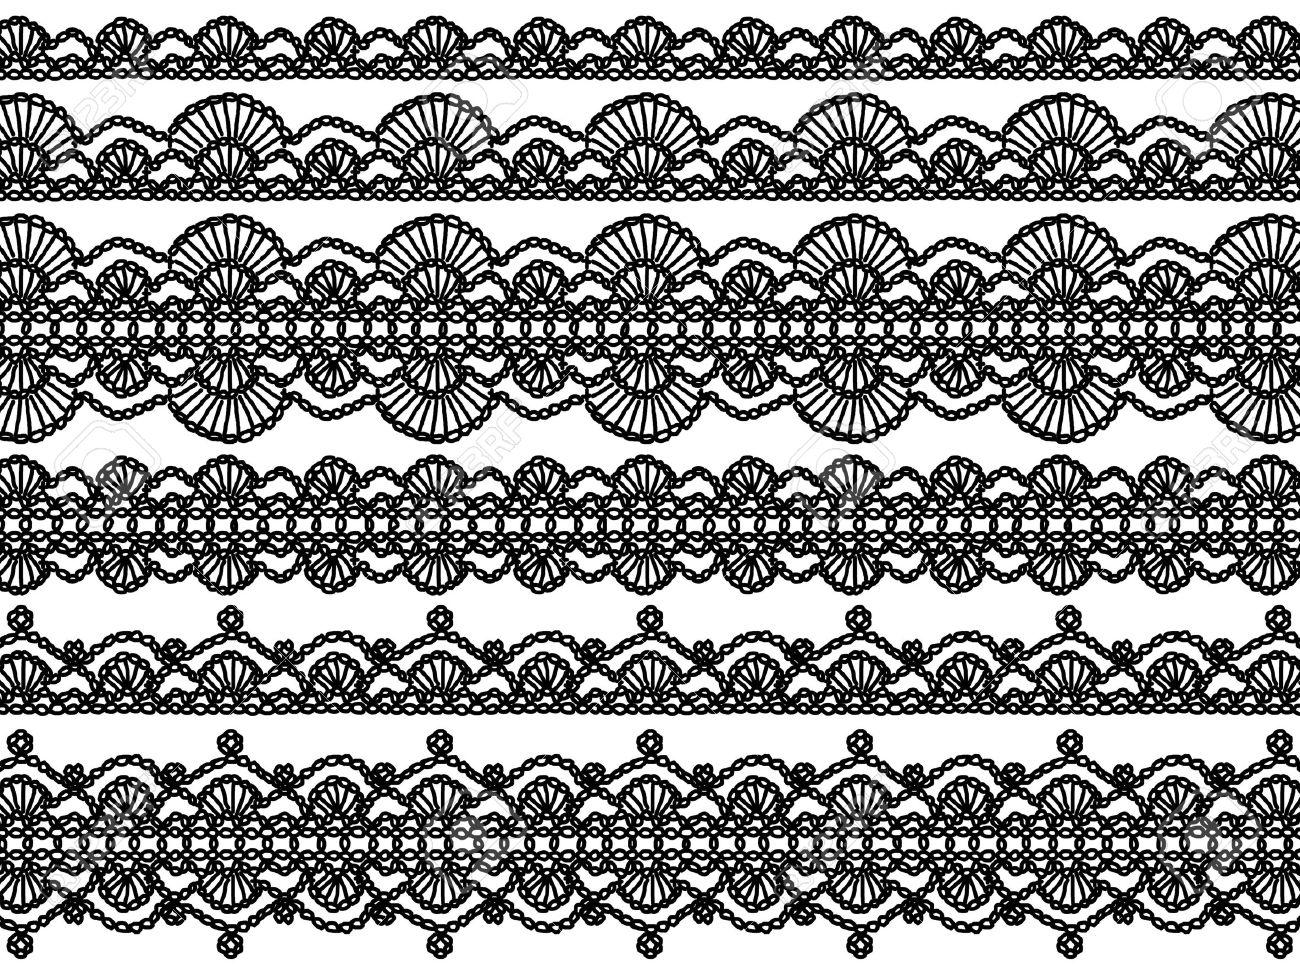 Elegant Background Pattern Black And White Black and white elegant